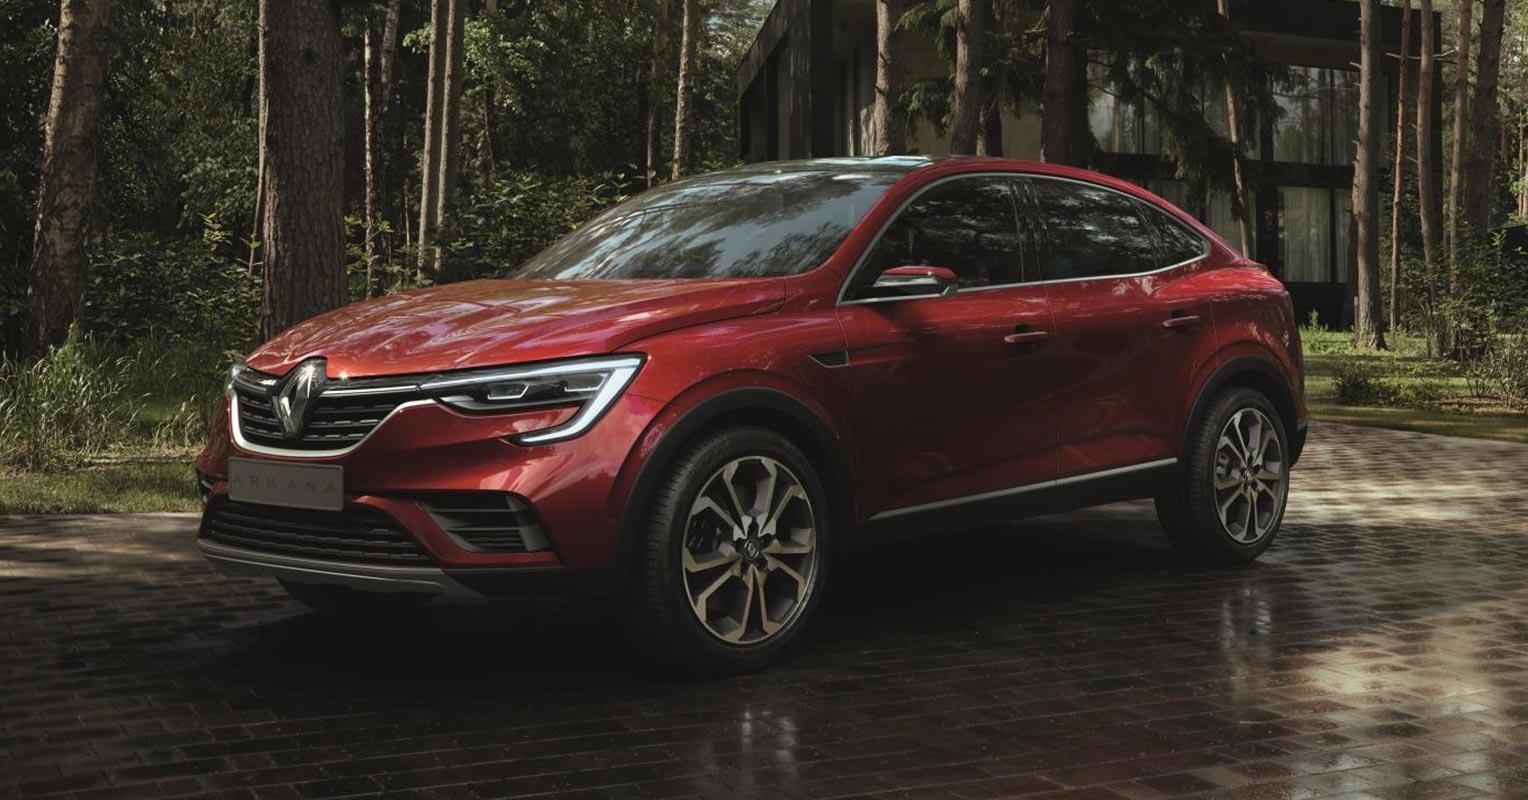 Trasera del Renault Arkana 2019